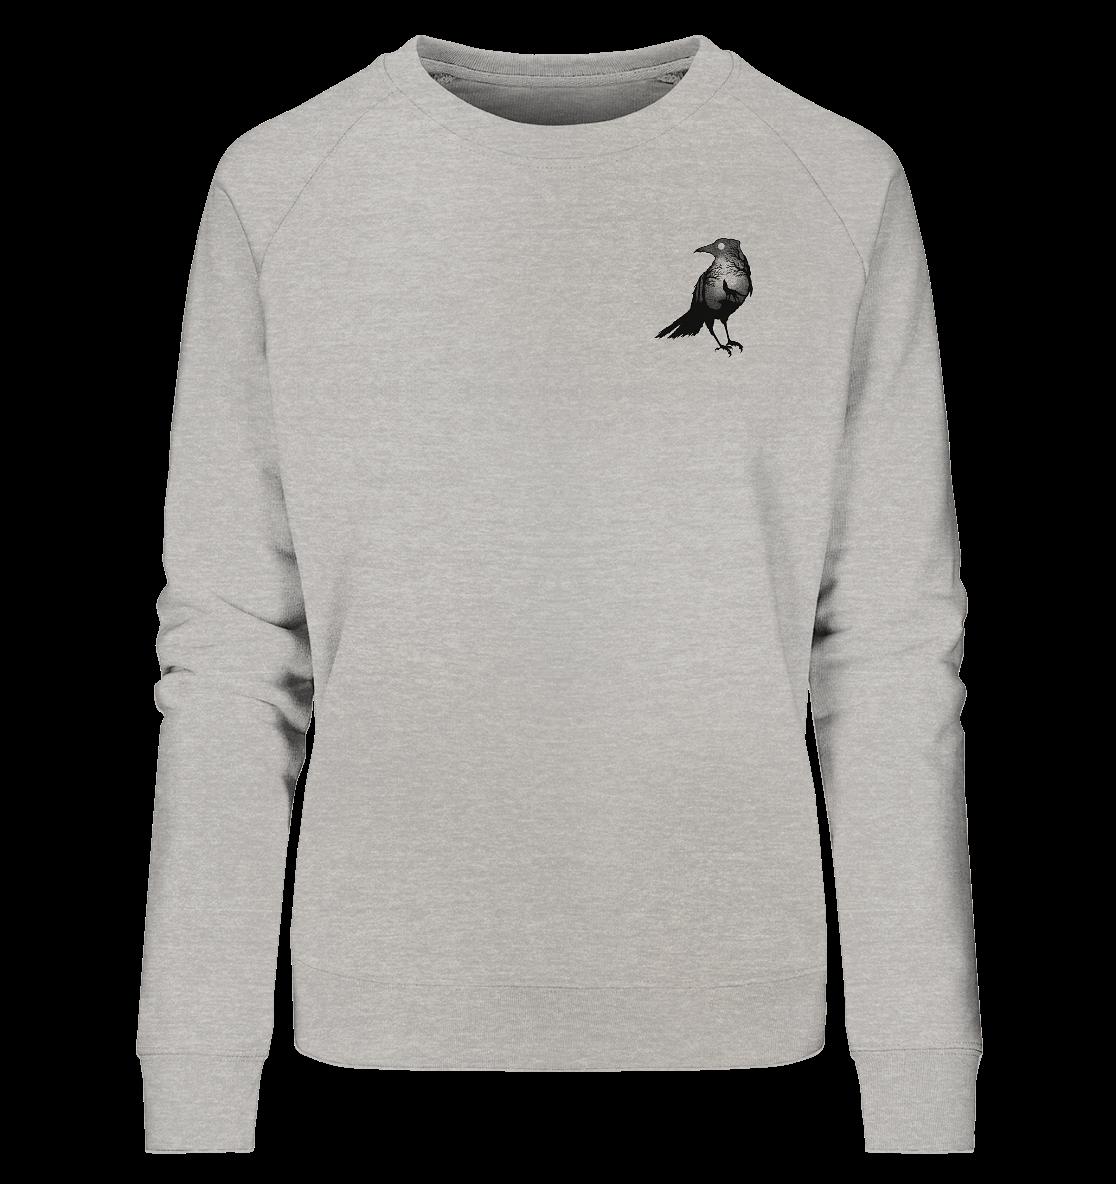 front-ladies-organic-sweatshirt-c2c1c0-1116x-5.png